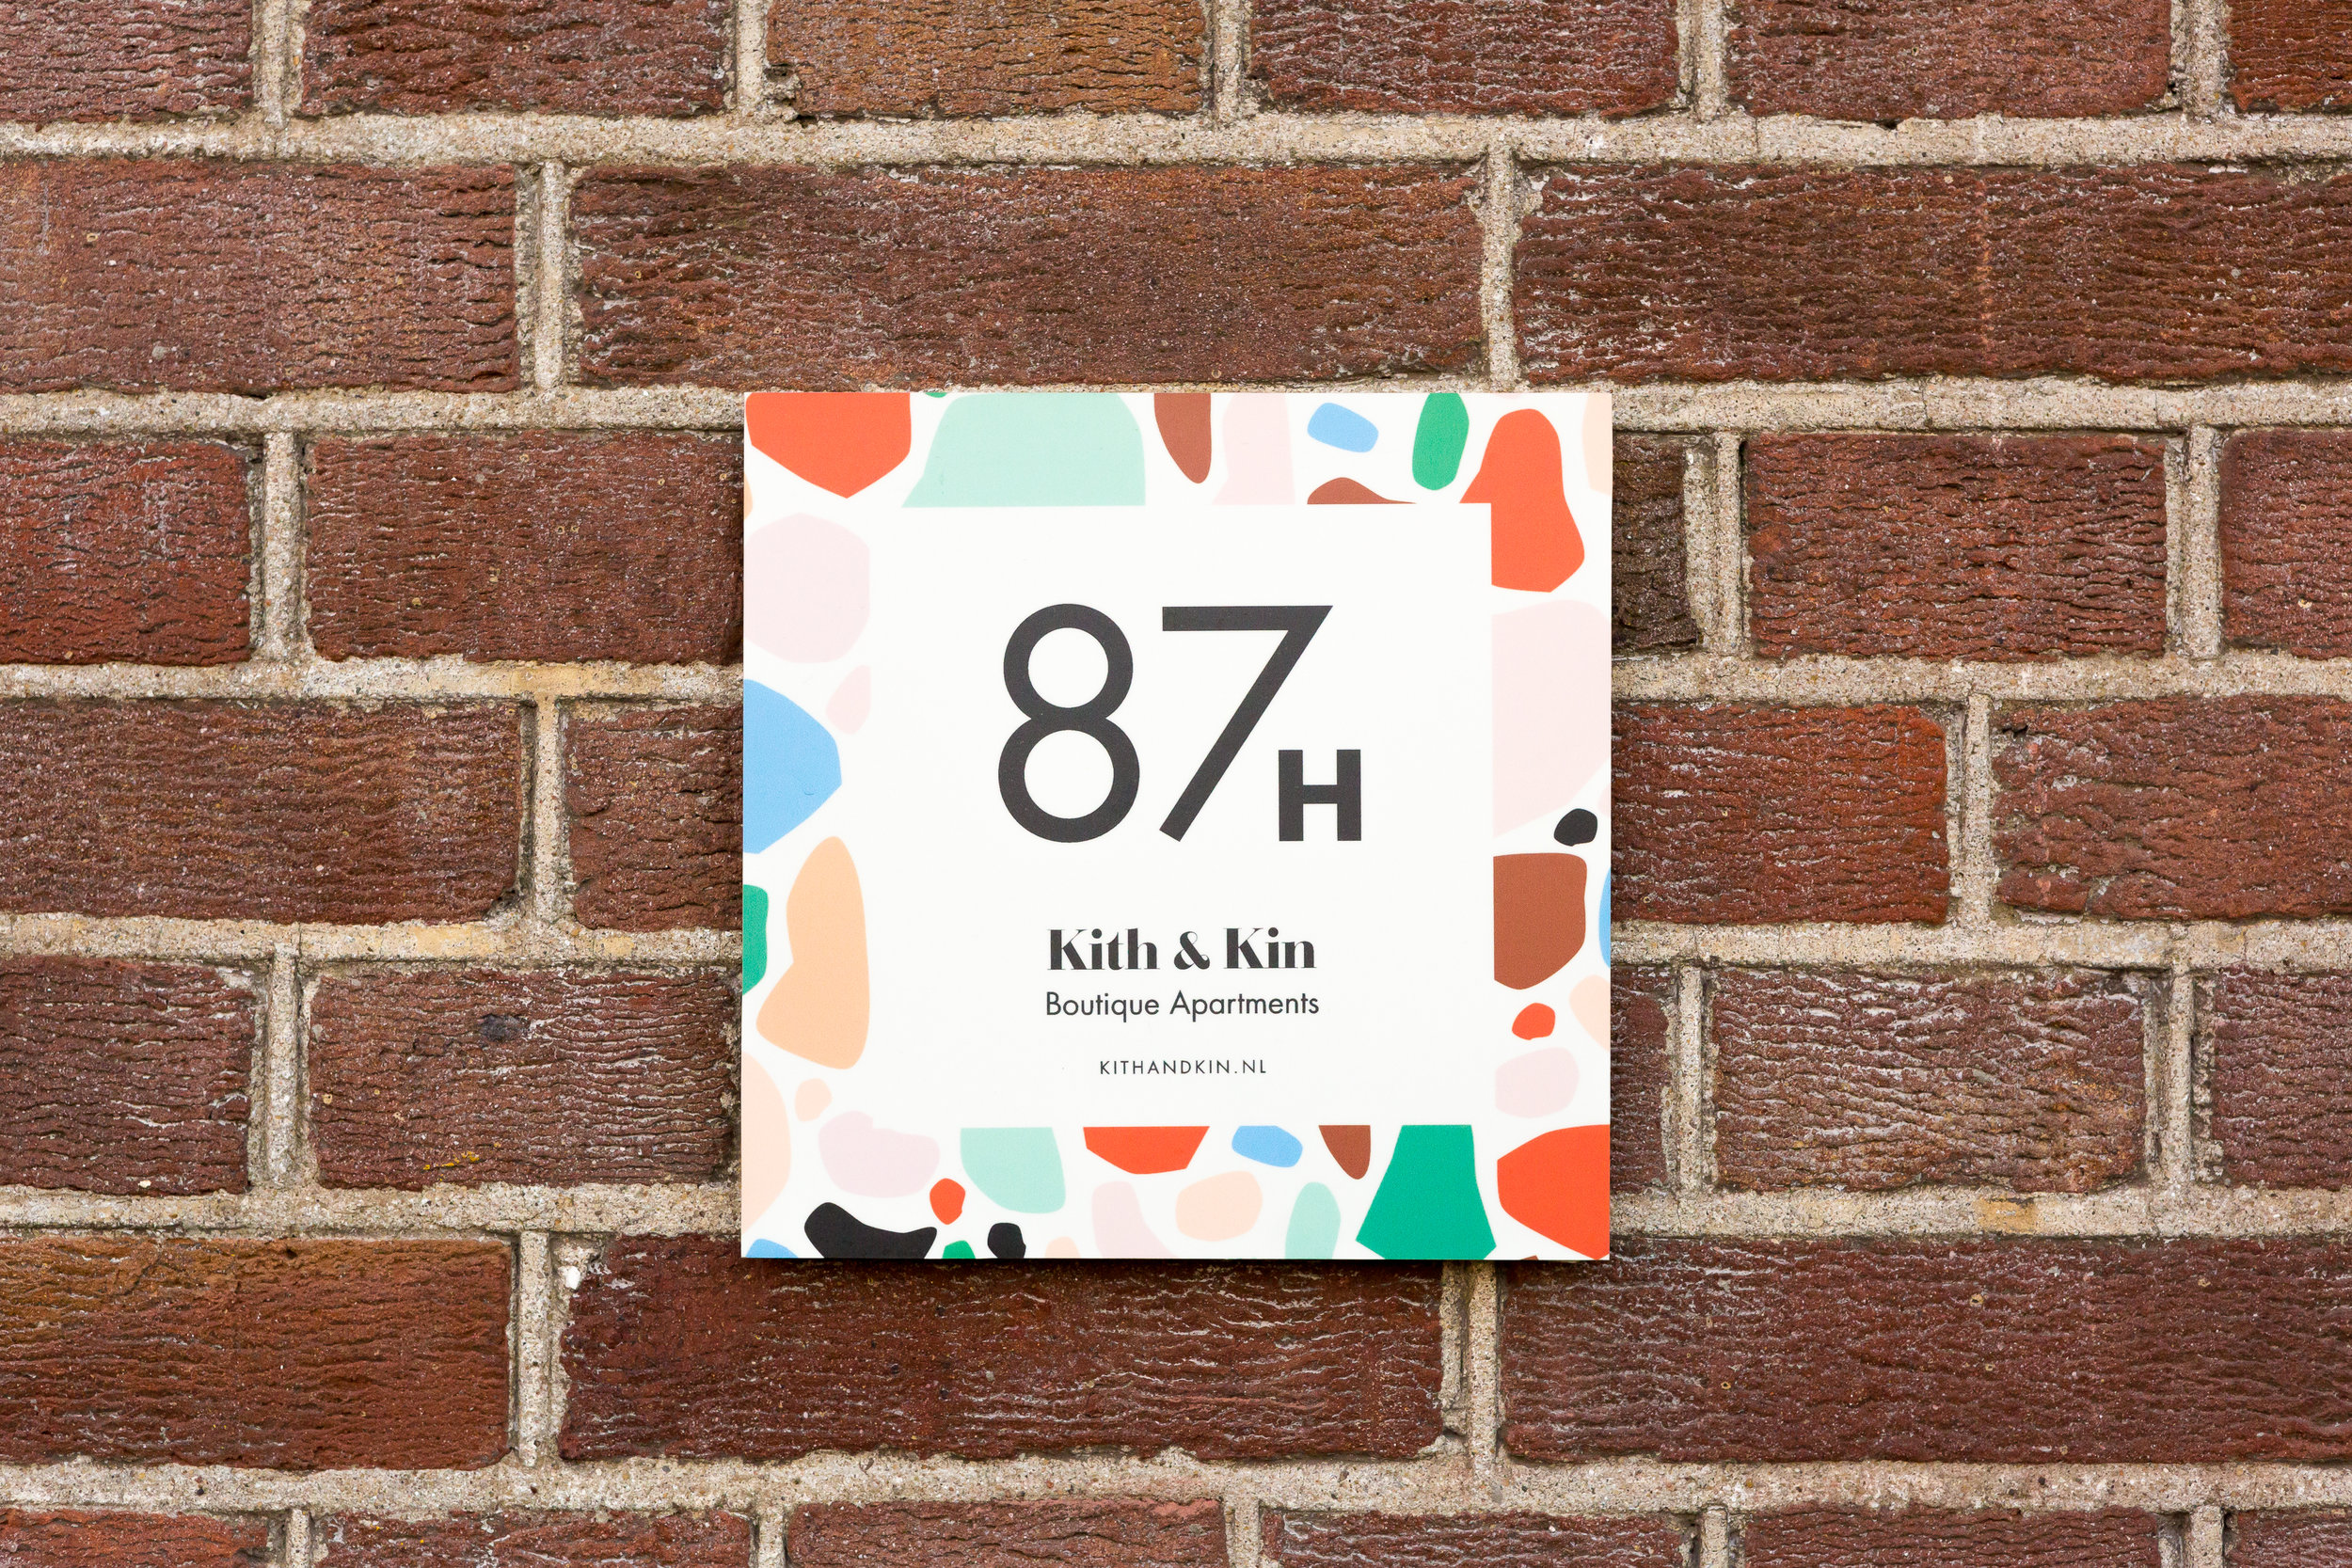 322 - Kith & Kin.JPG